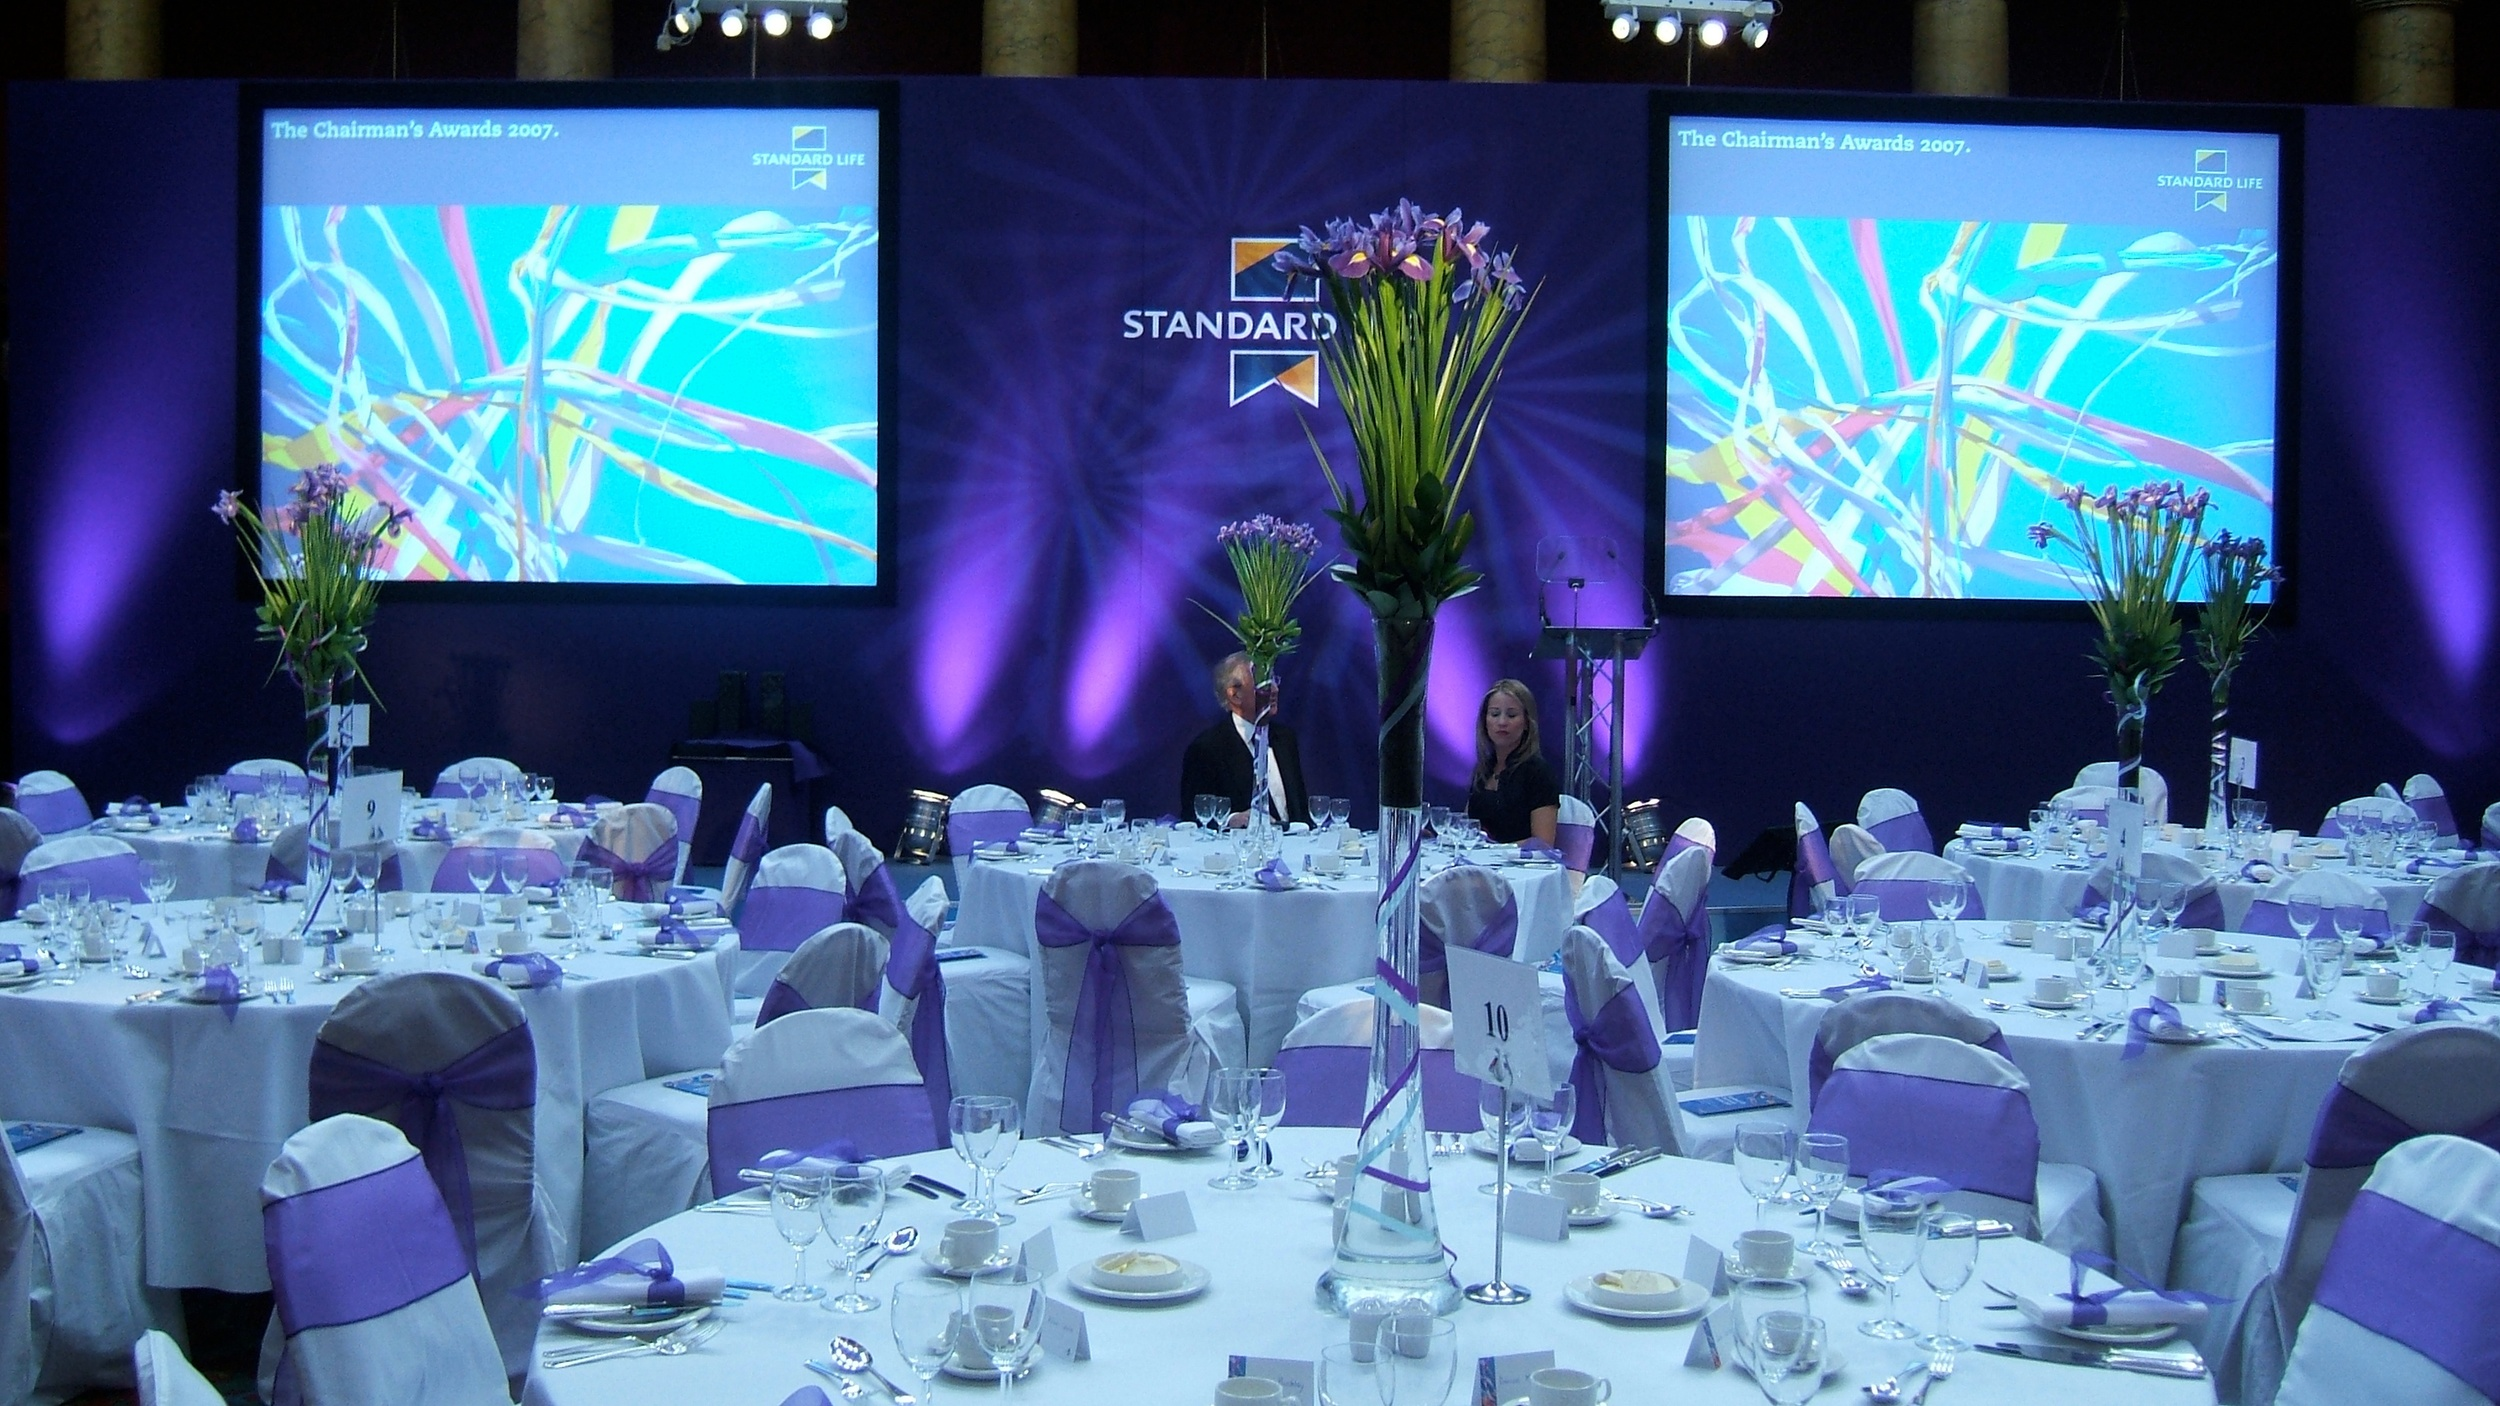 STD41 Chairmans' Awards 007.jpg